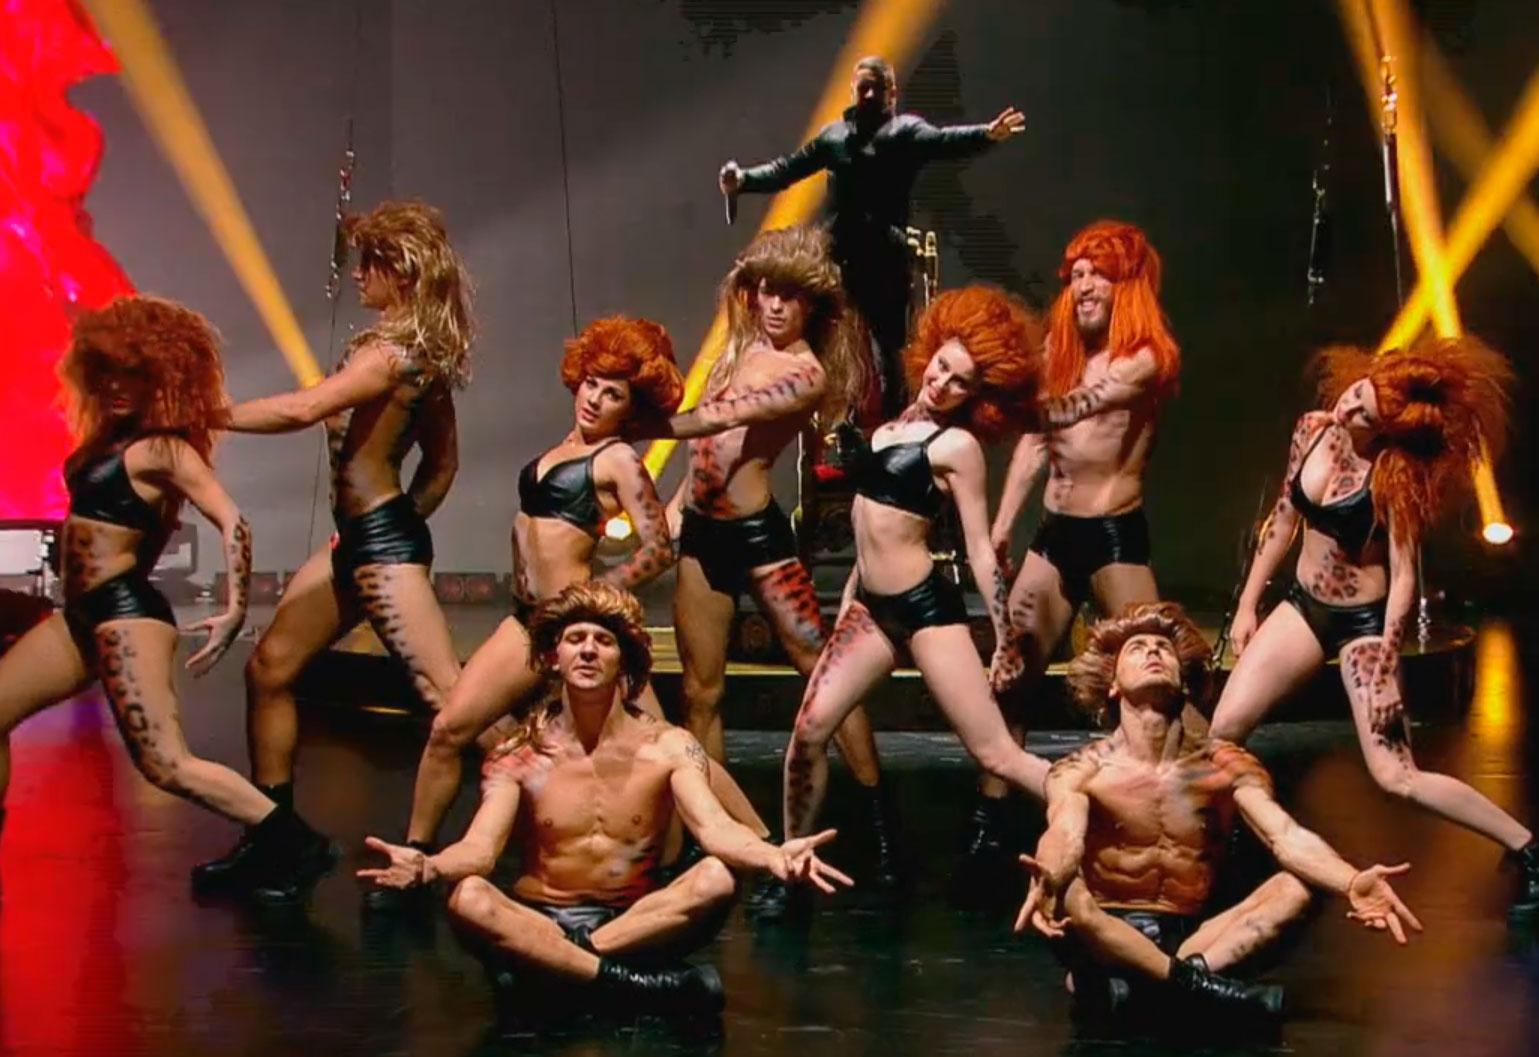 Команда Егора Дружинина в шоу Танцы на ТНТ